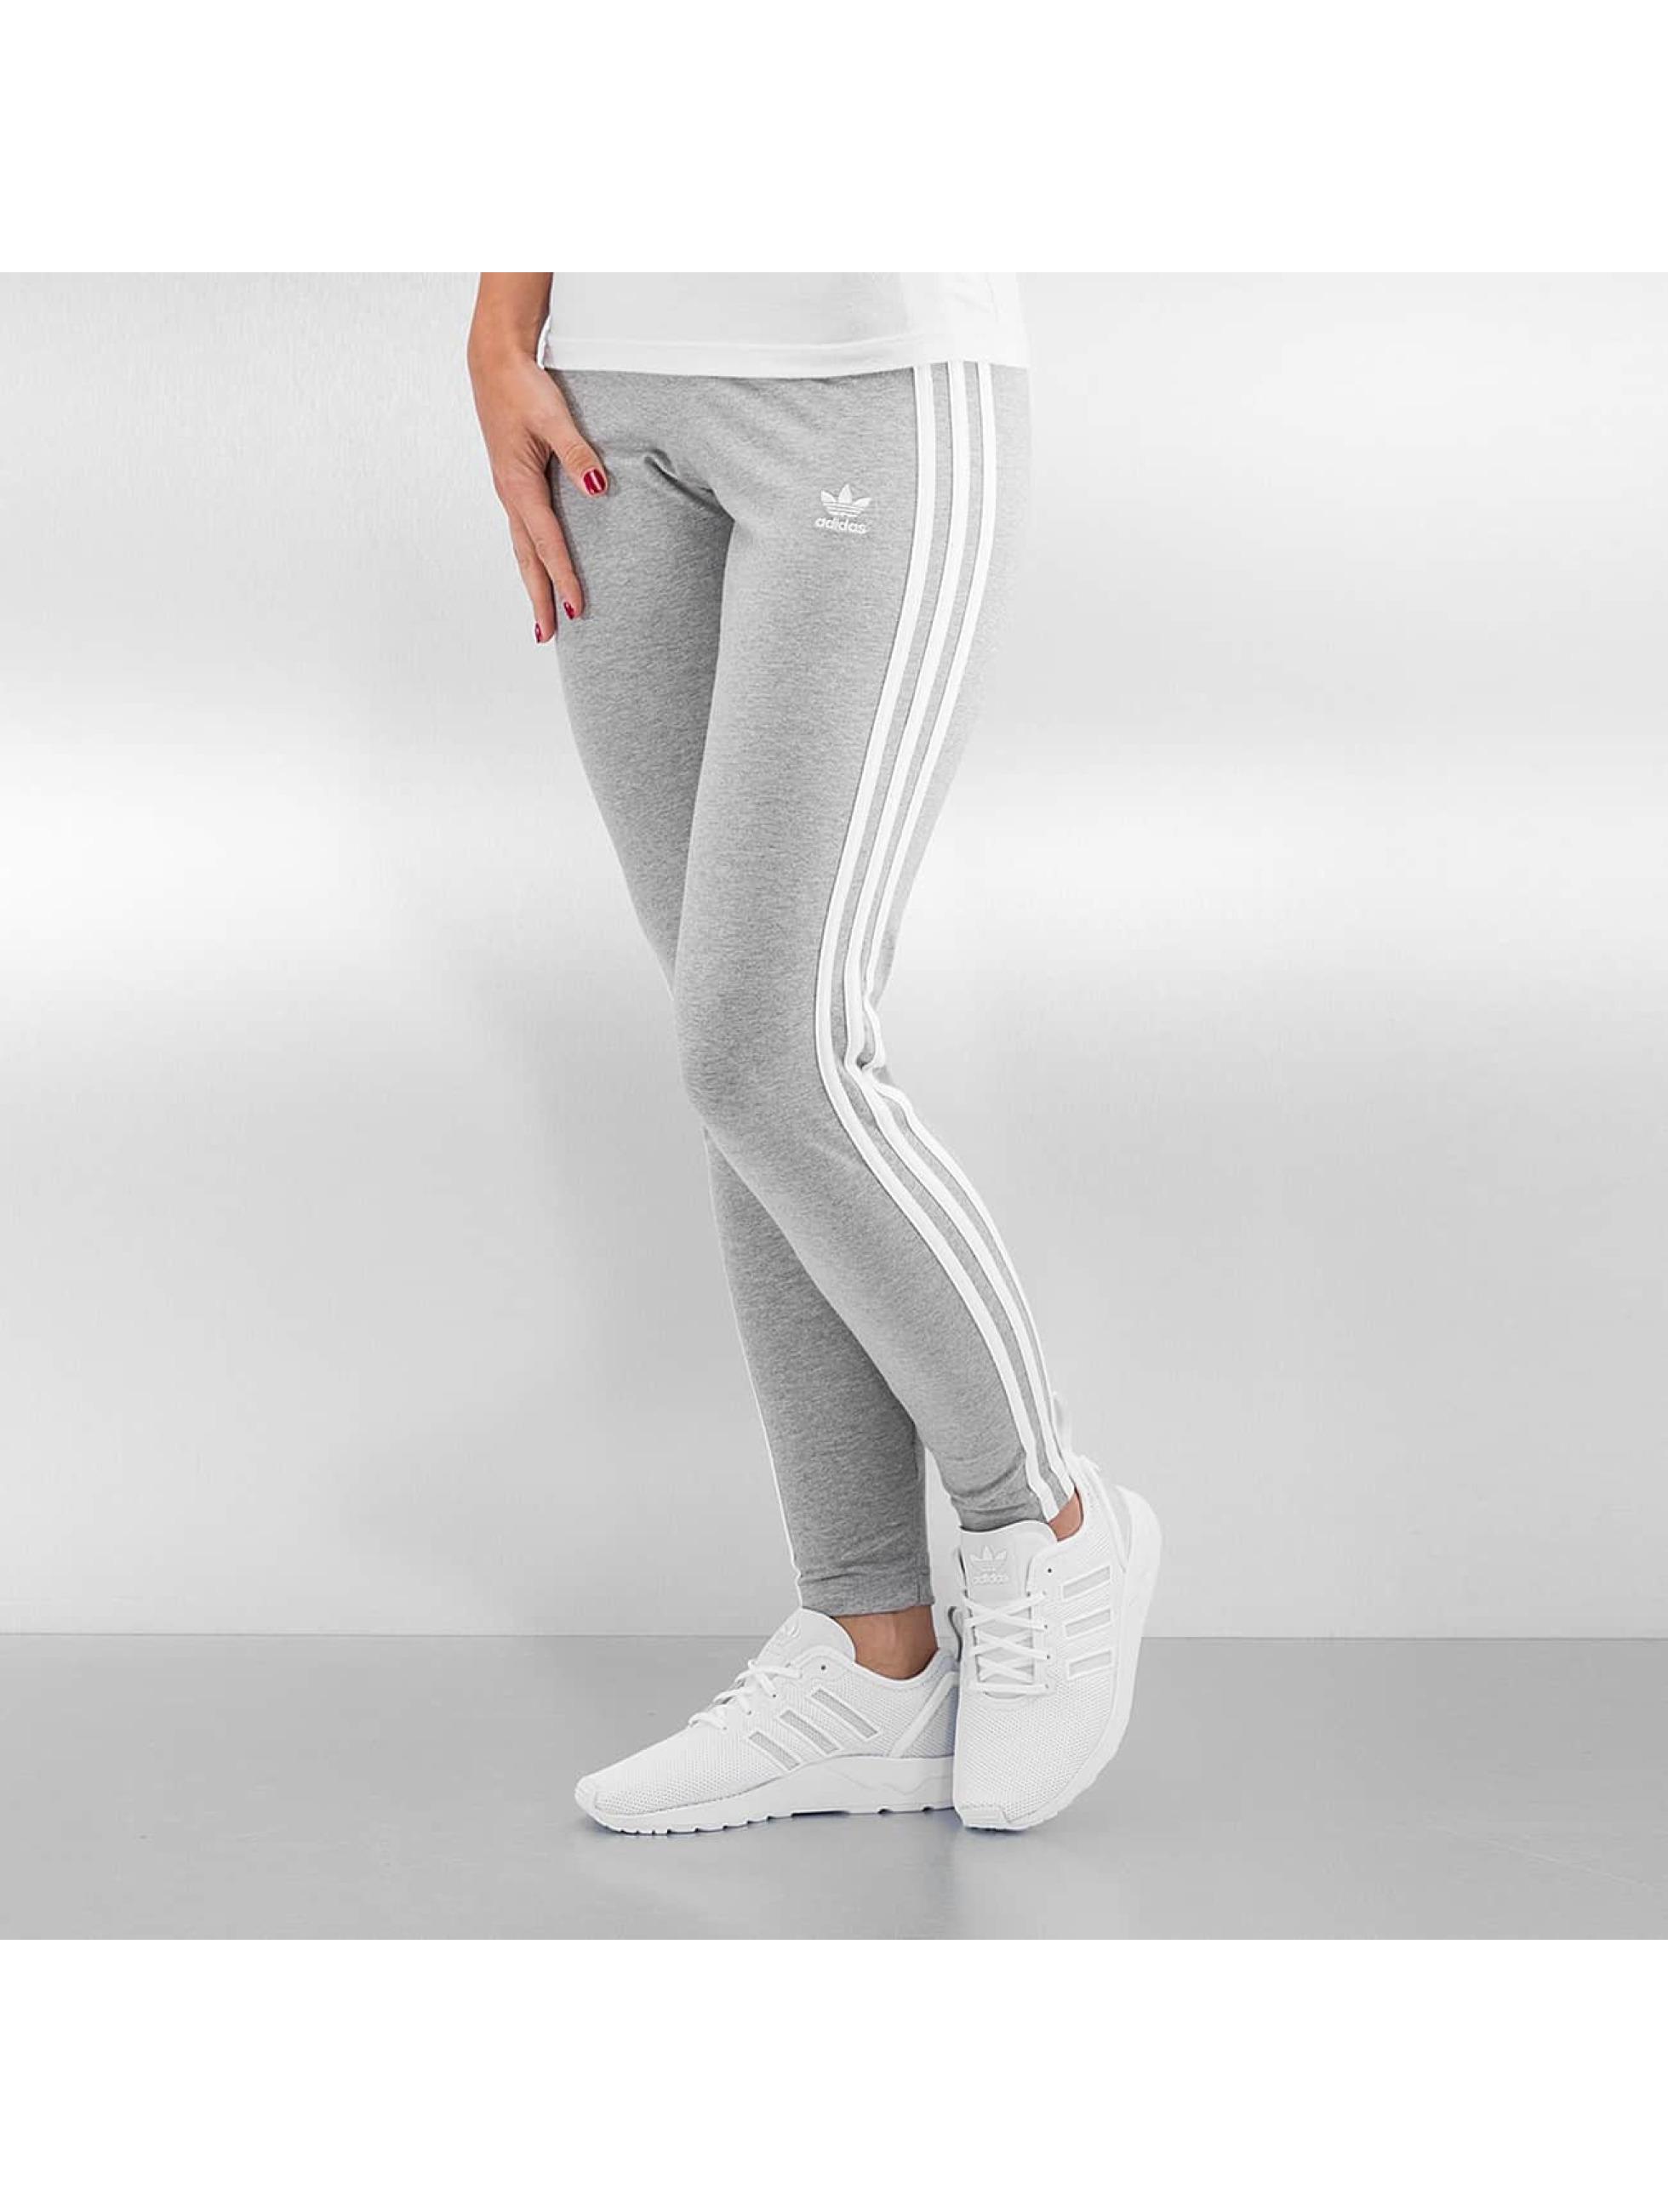 adidas pantalon leggings 3 stripes en gris 286522. Black Bedroom Furniture Sets. Home Design Ideas